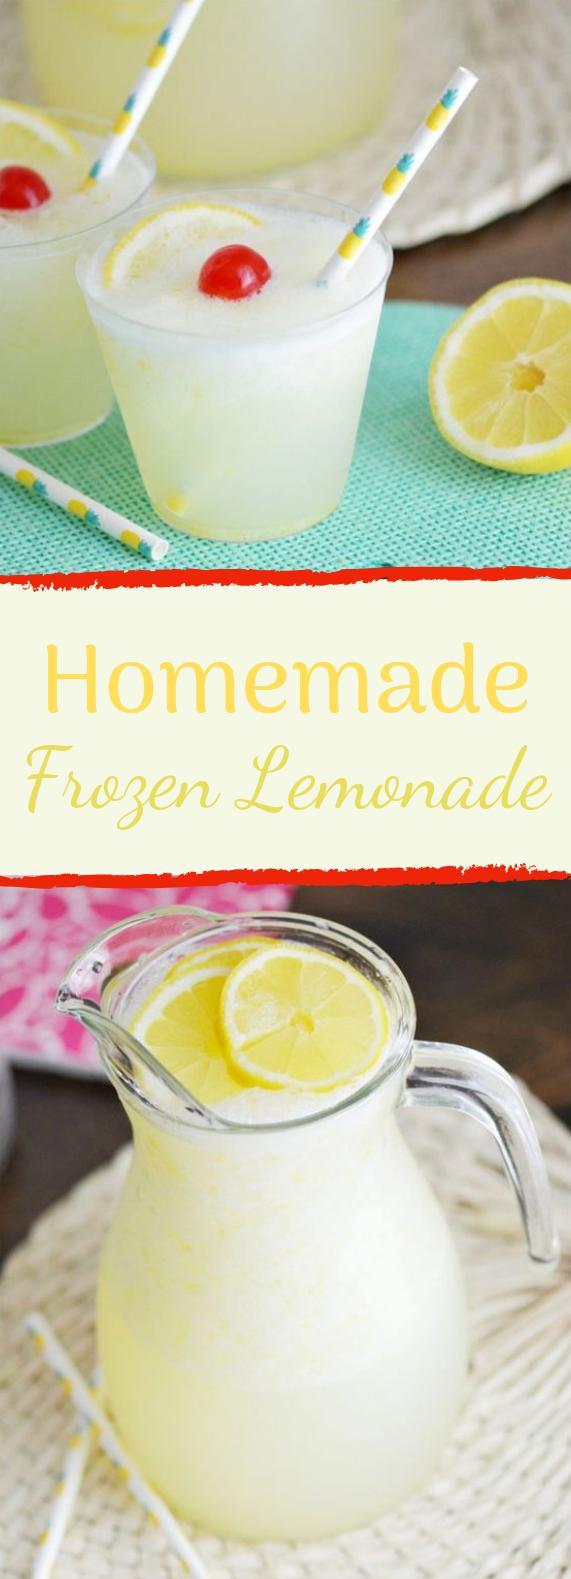 Homemade Frozen Lemonade #drinks #kidfriendly